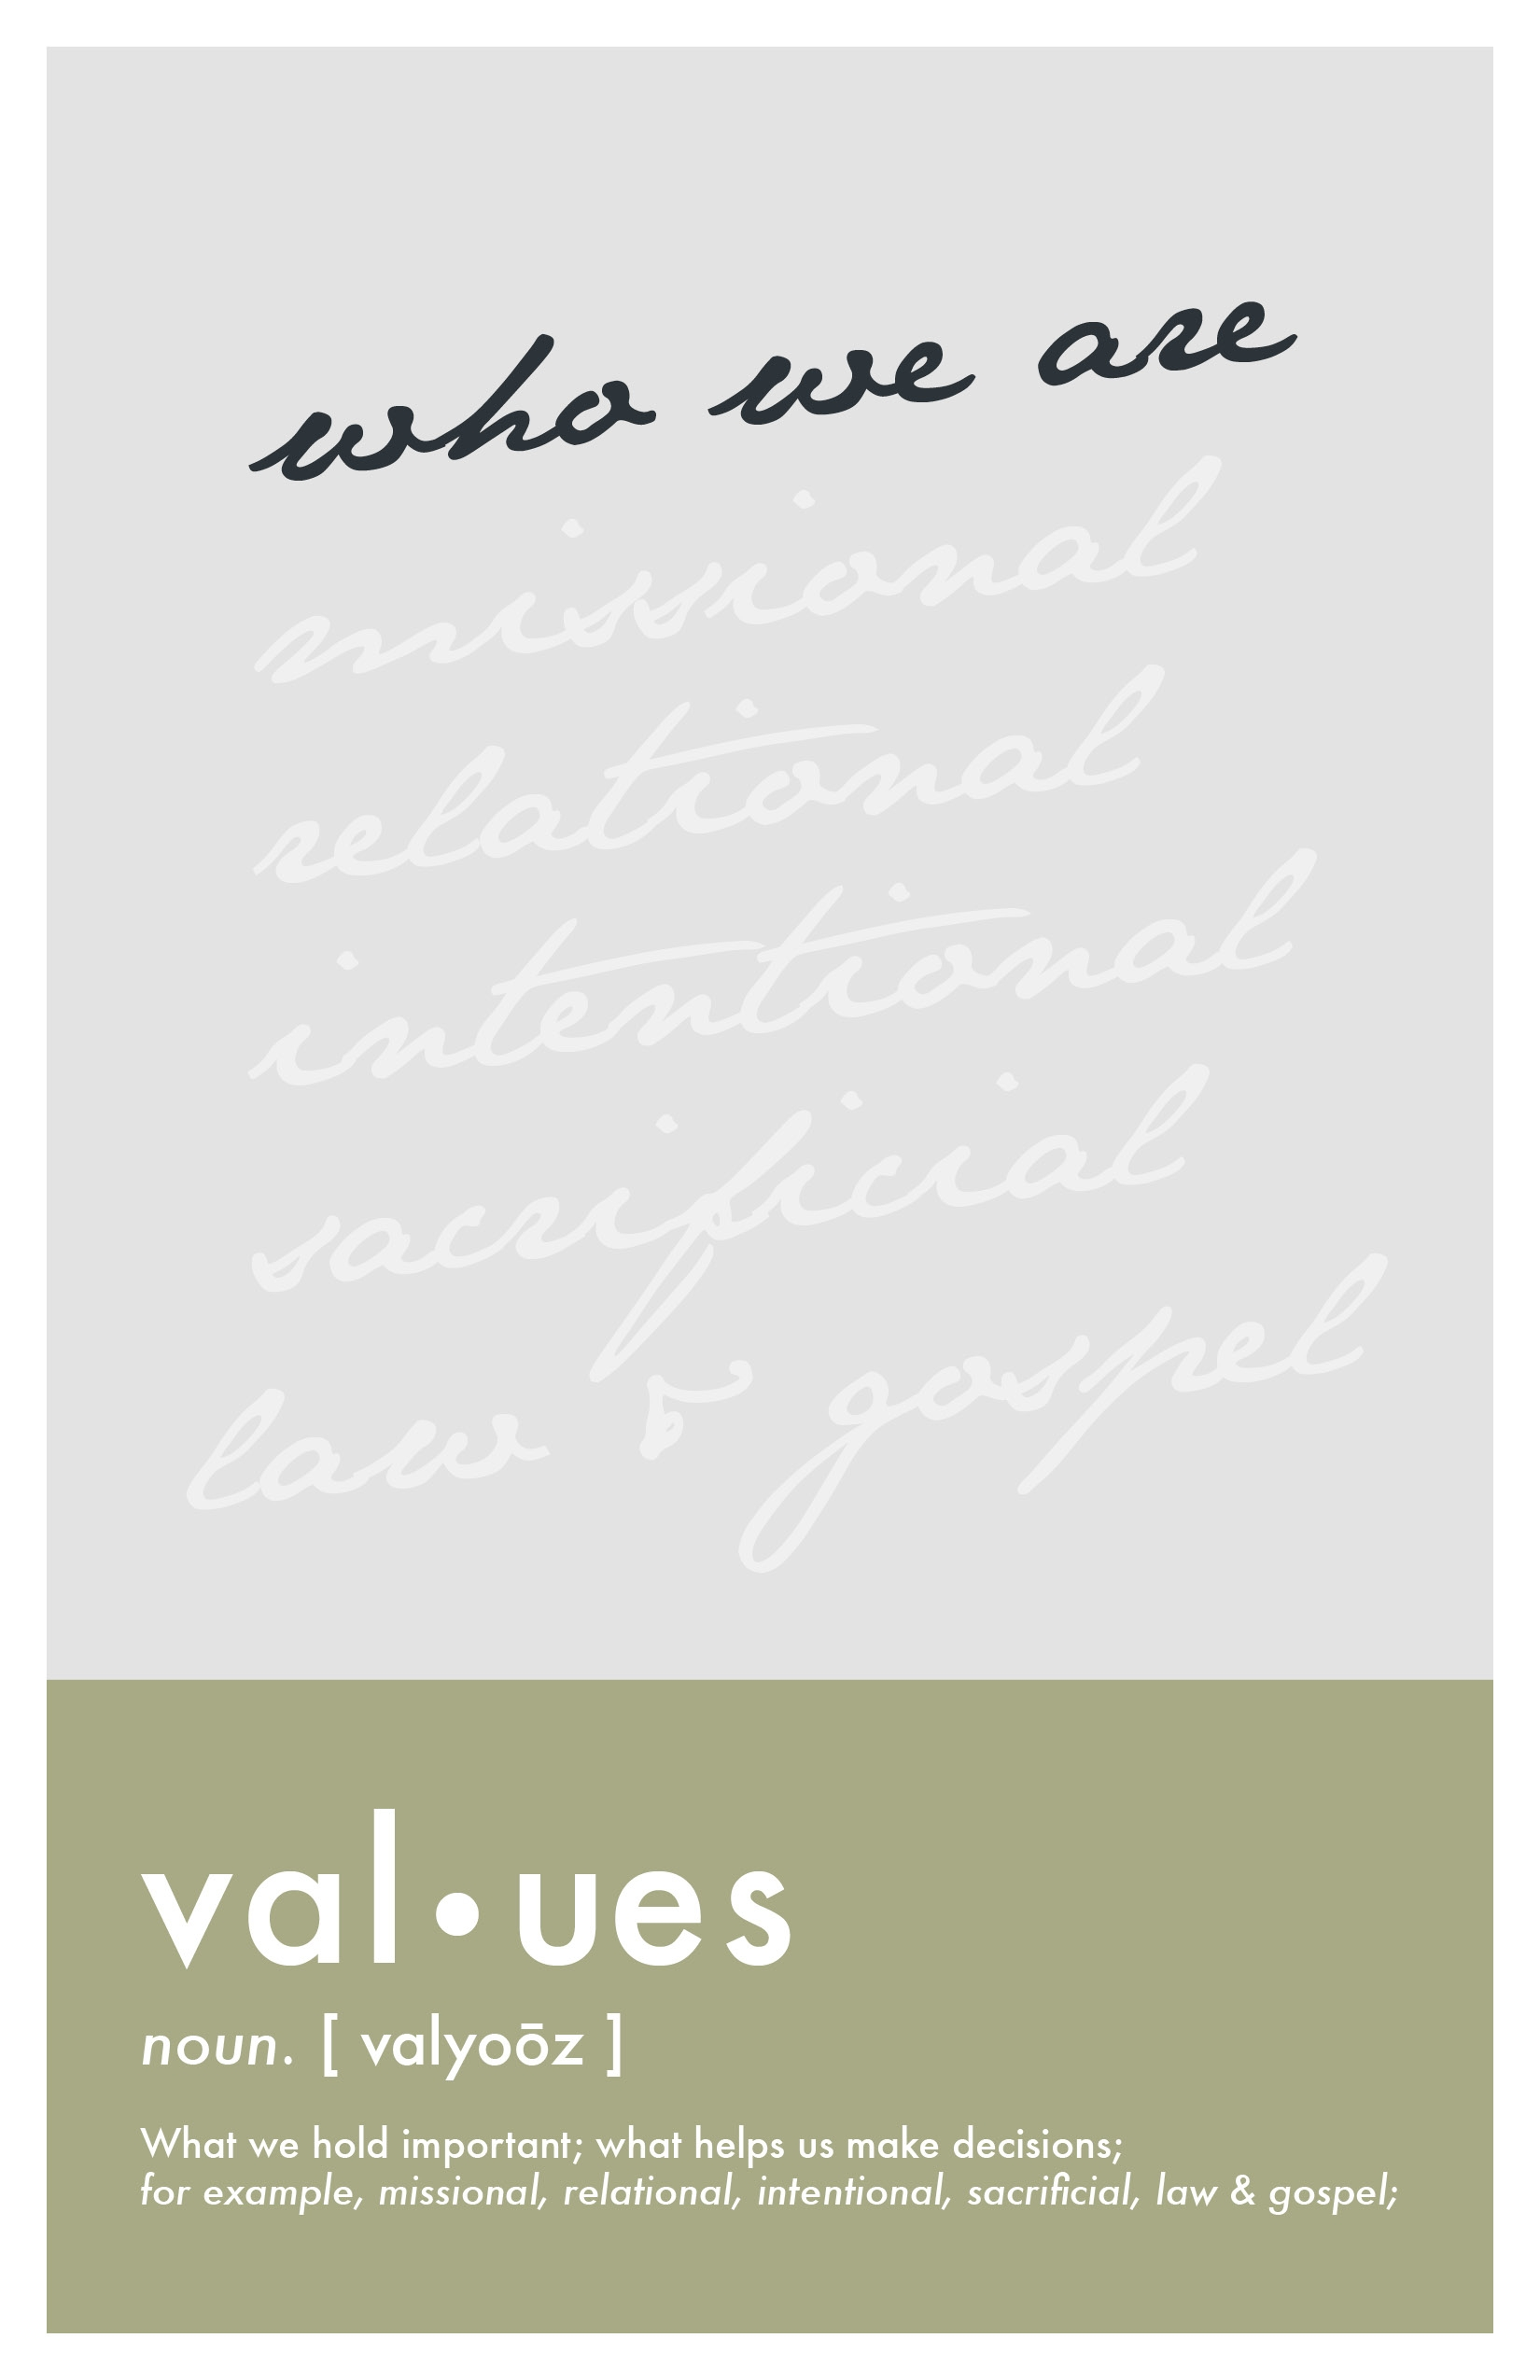 Values-Wk1-Bulletin.jpg